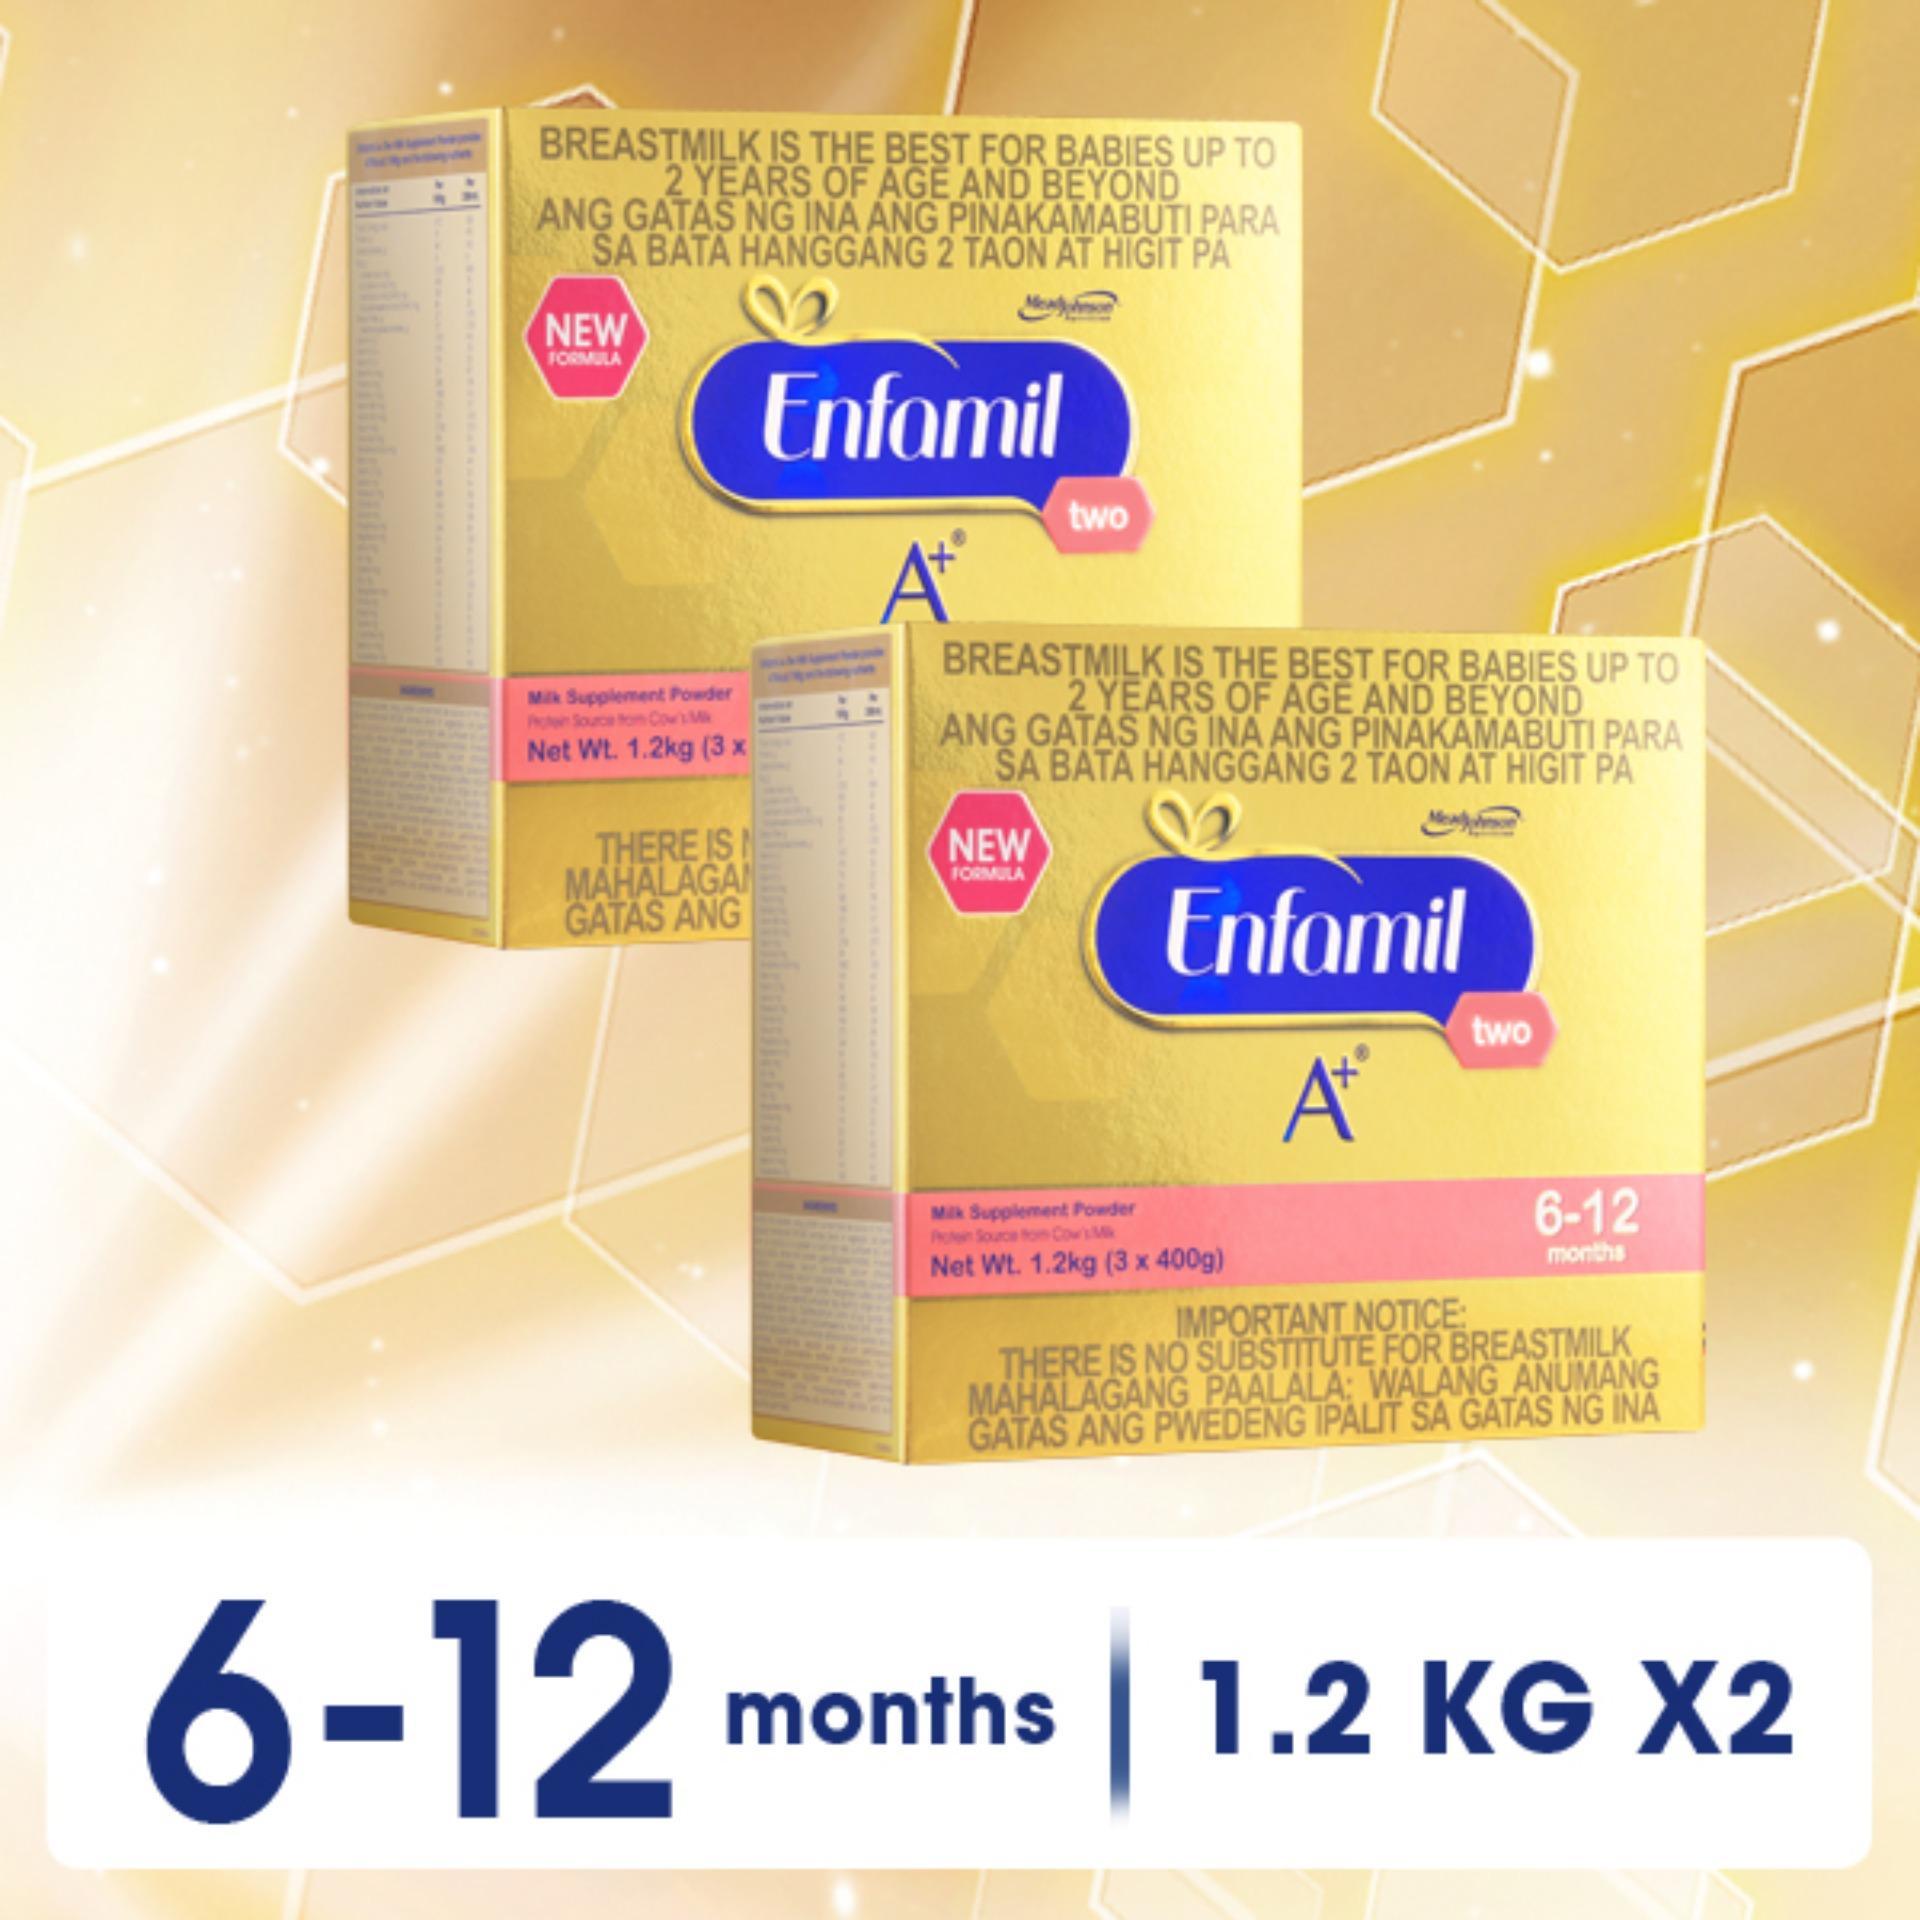 Enfamil Philippines Enfamil Price List Infant Milk Formula For